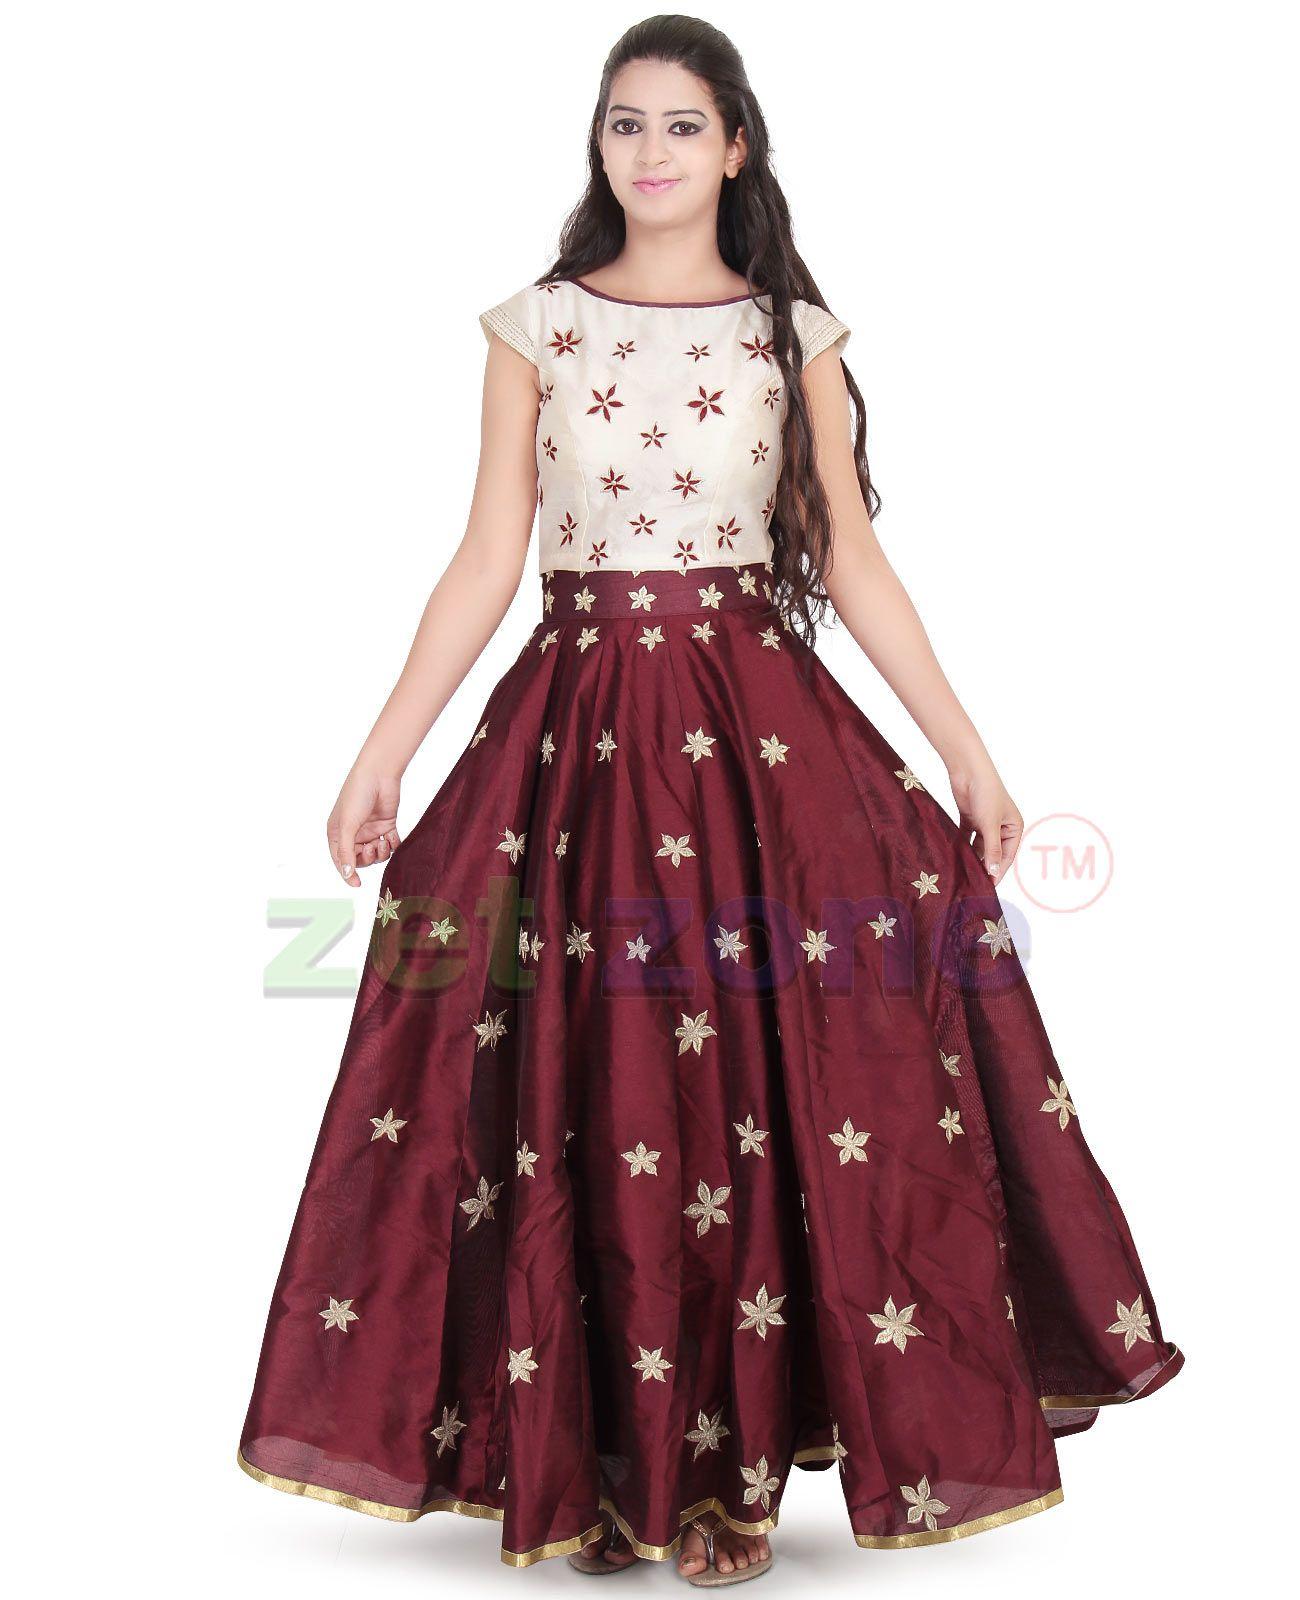 0c9d65d835b3d8 Maroon & Cream Stunning Umbrella Cut Lehenga-Choli, Latest Traditional  Dress Comes With Gold